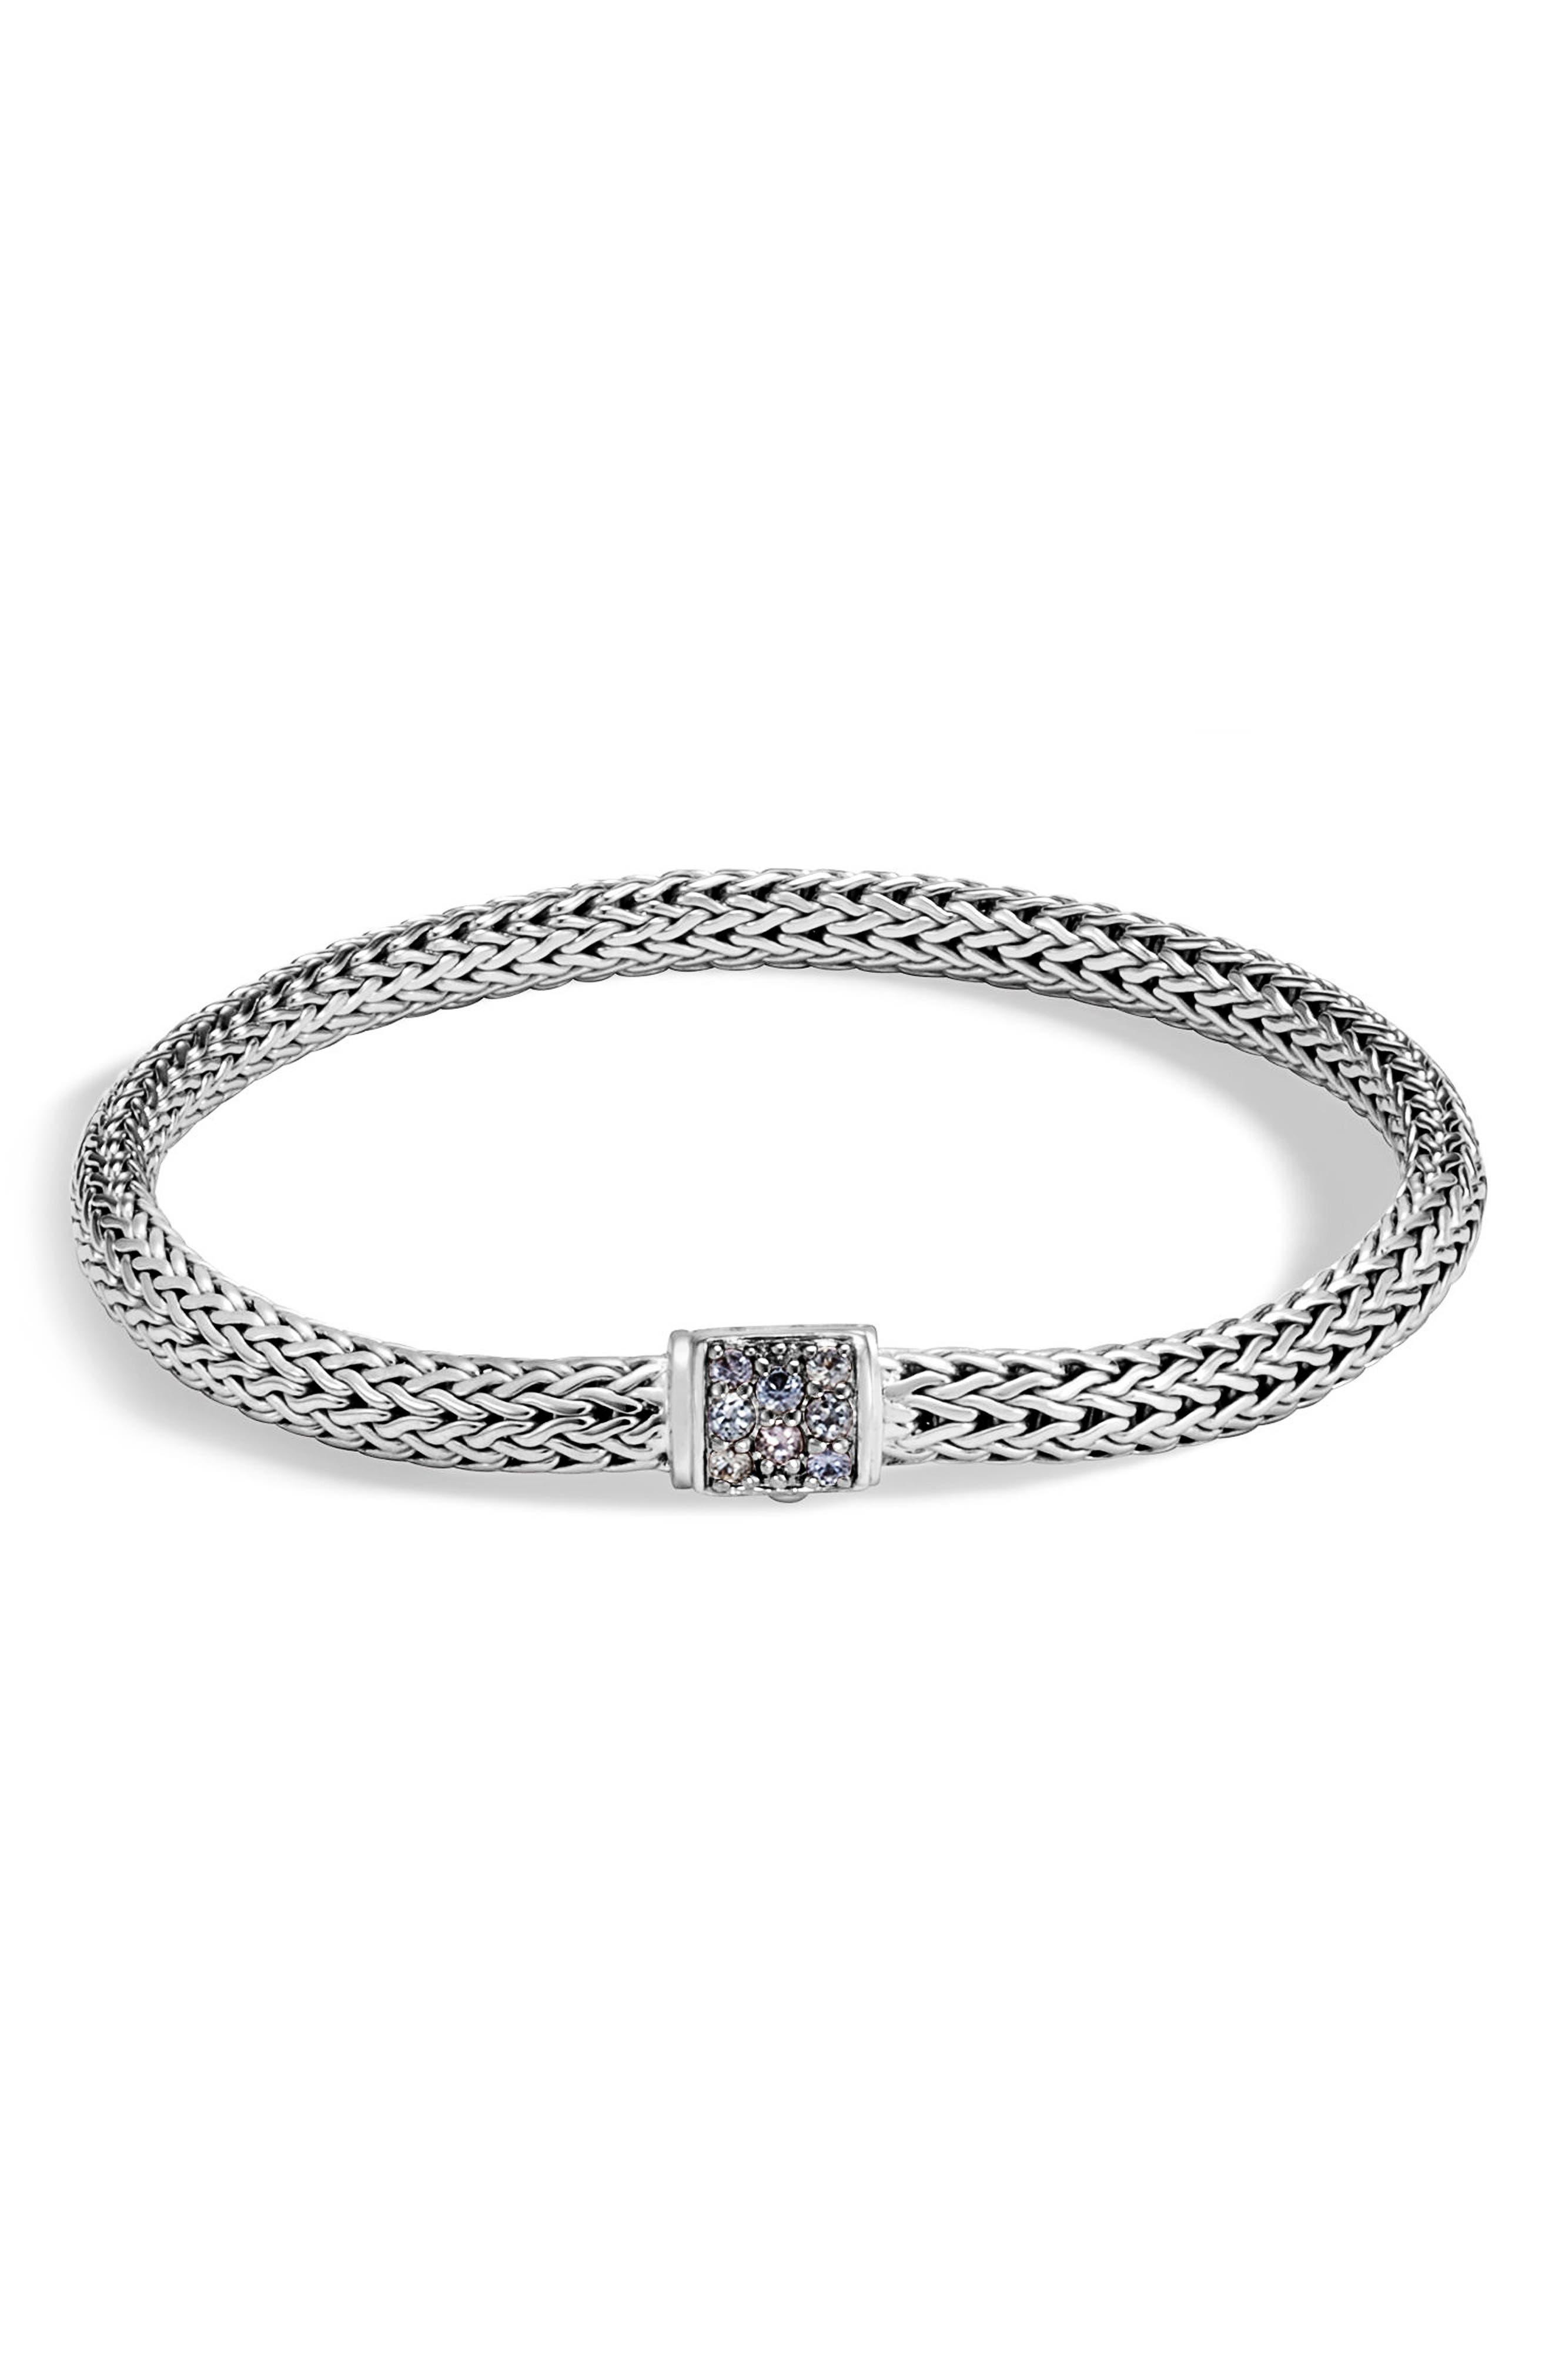 Main Image - John Hardy Classic Chain Extra Small Pavé Bracelet